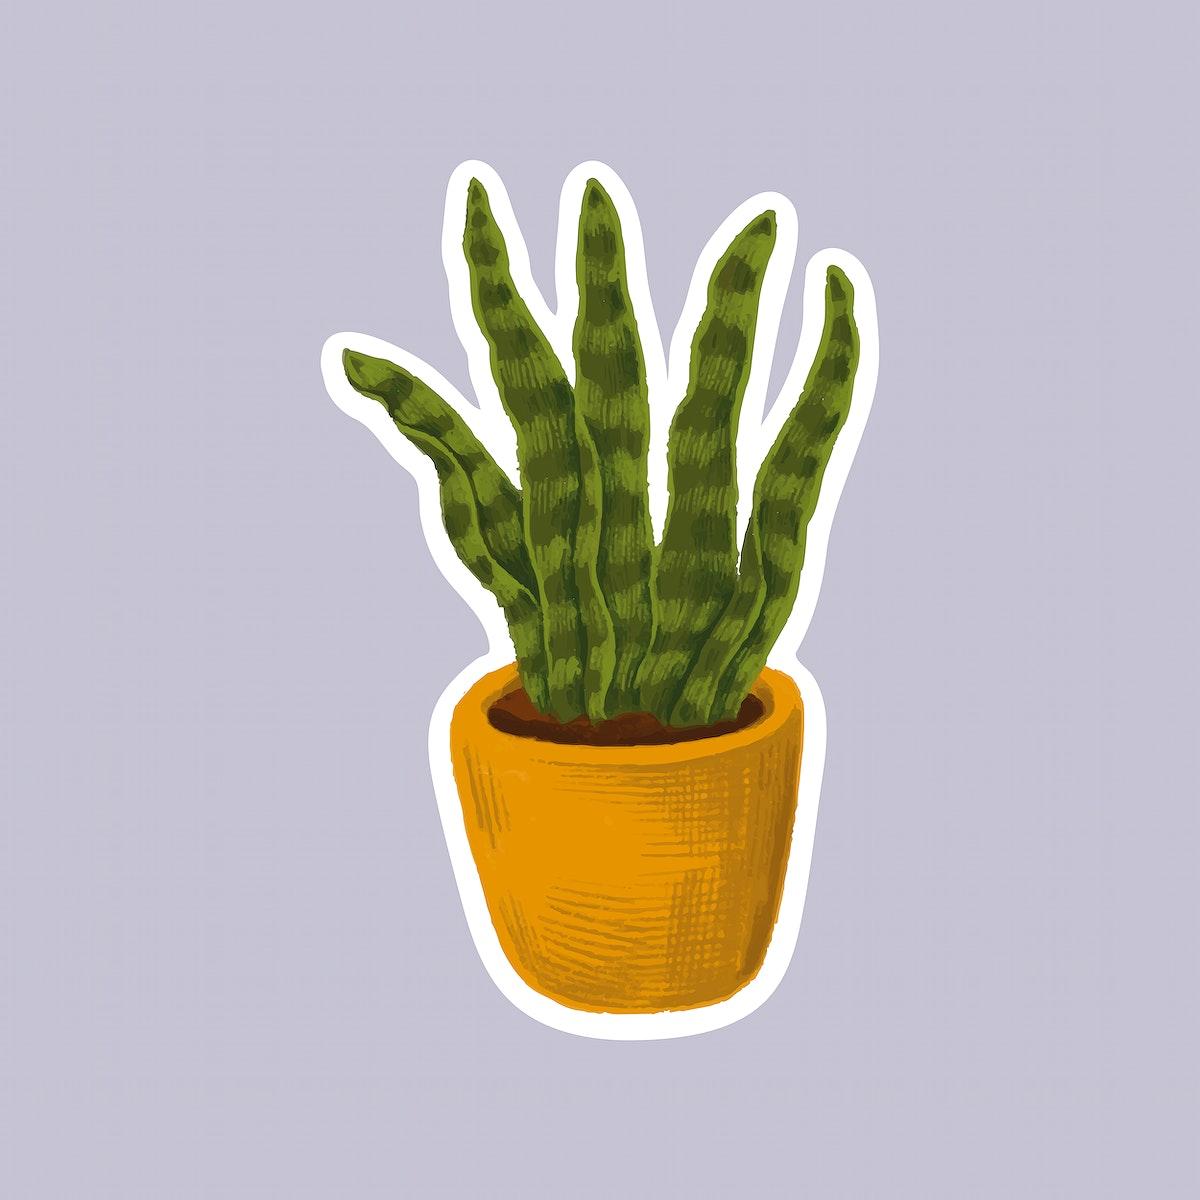 Snake plant in a pot sticker